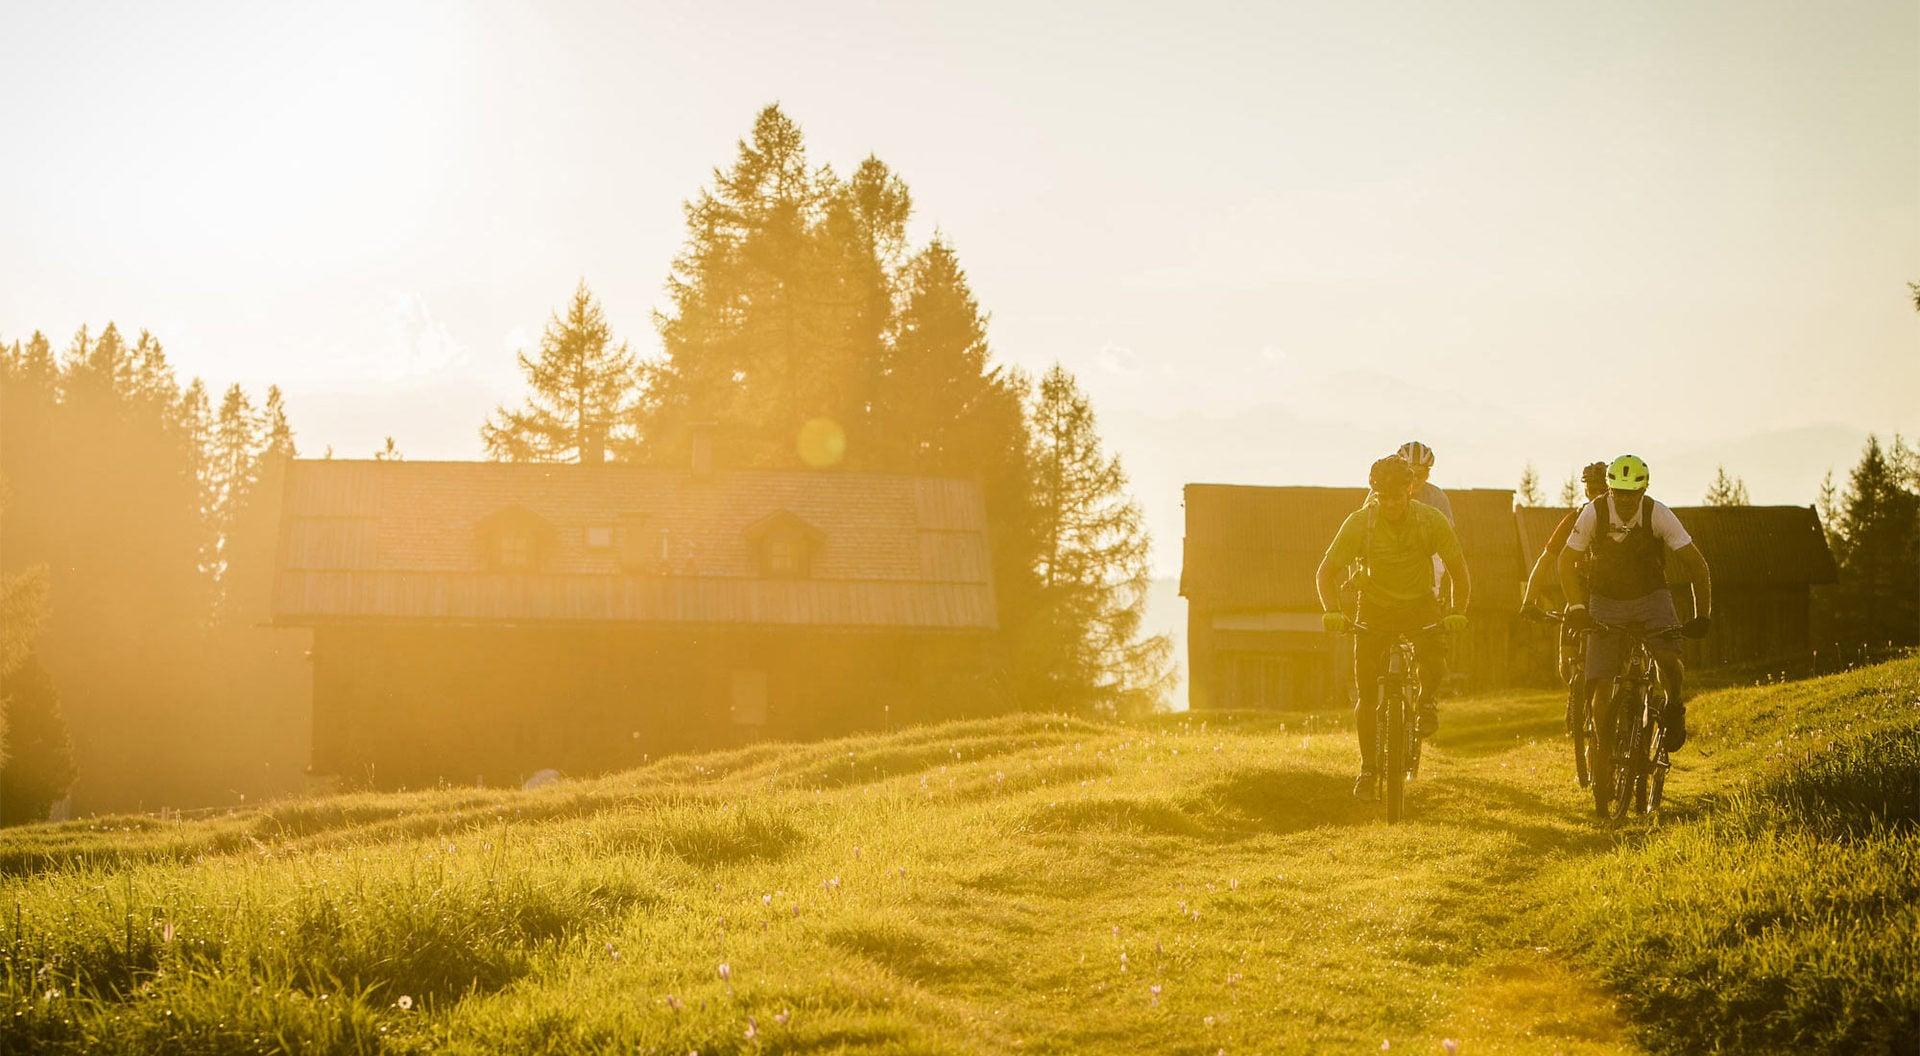 Mountain Biking, Bike Touring or Road Biking?